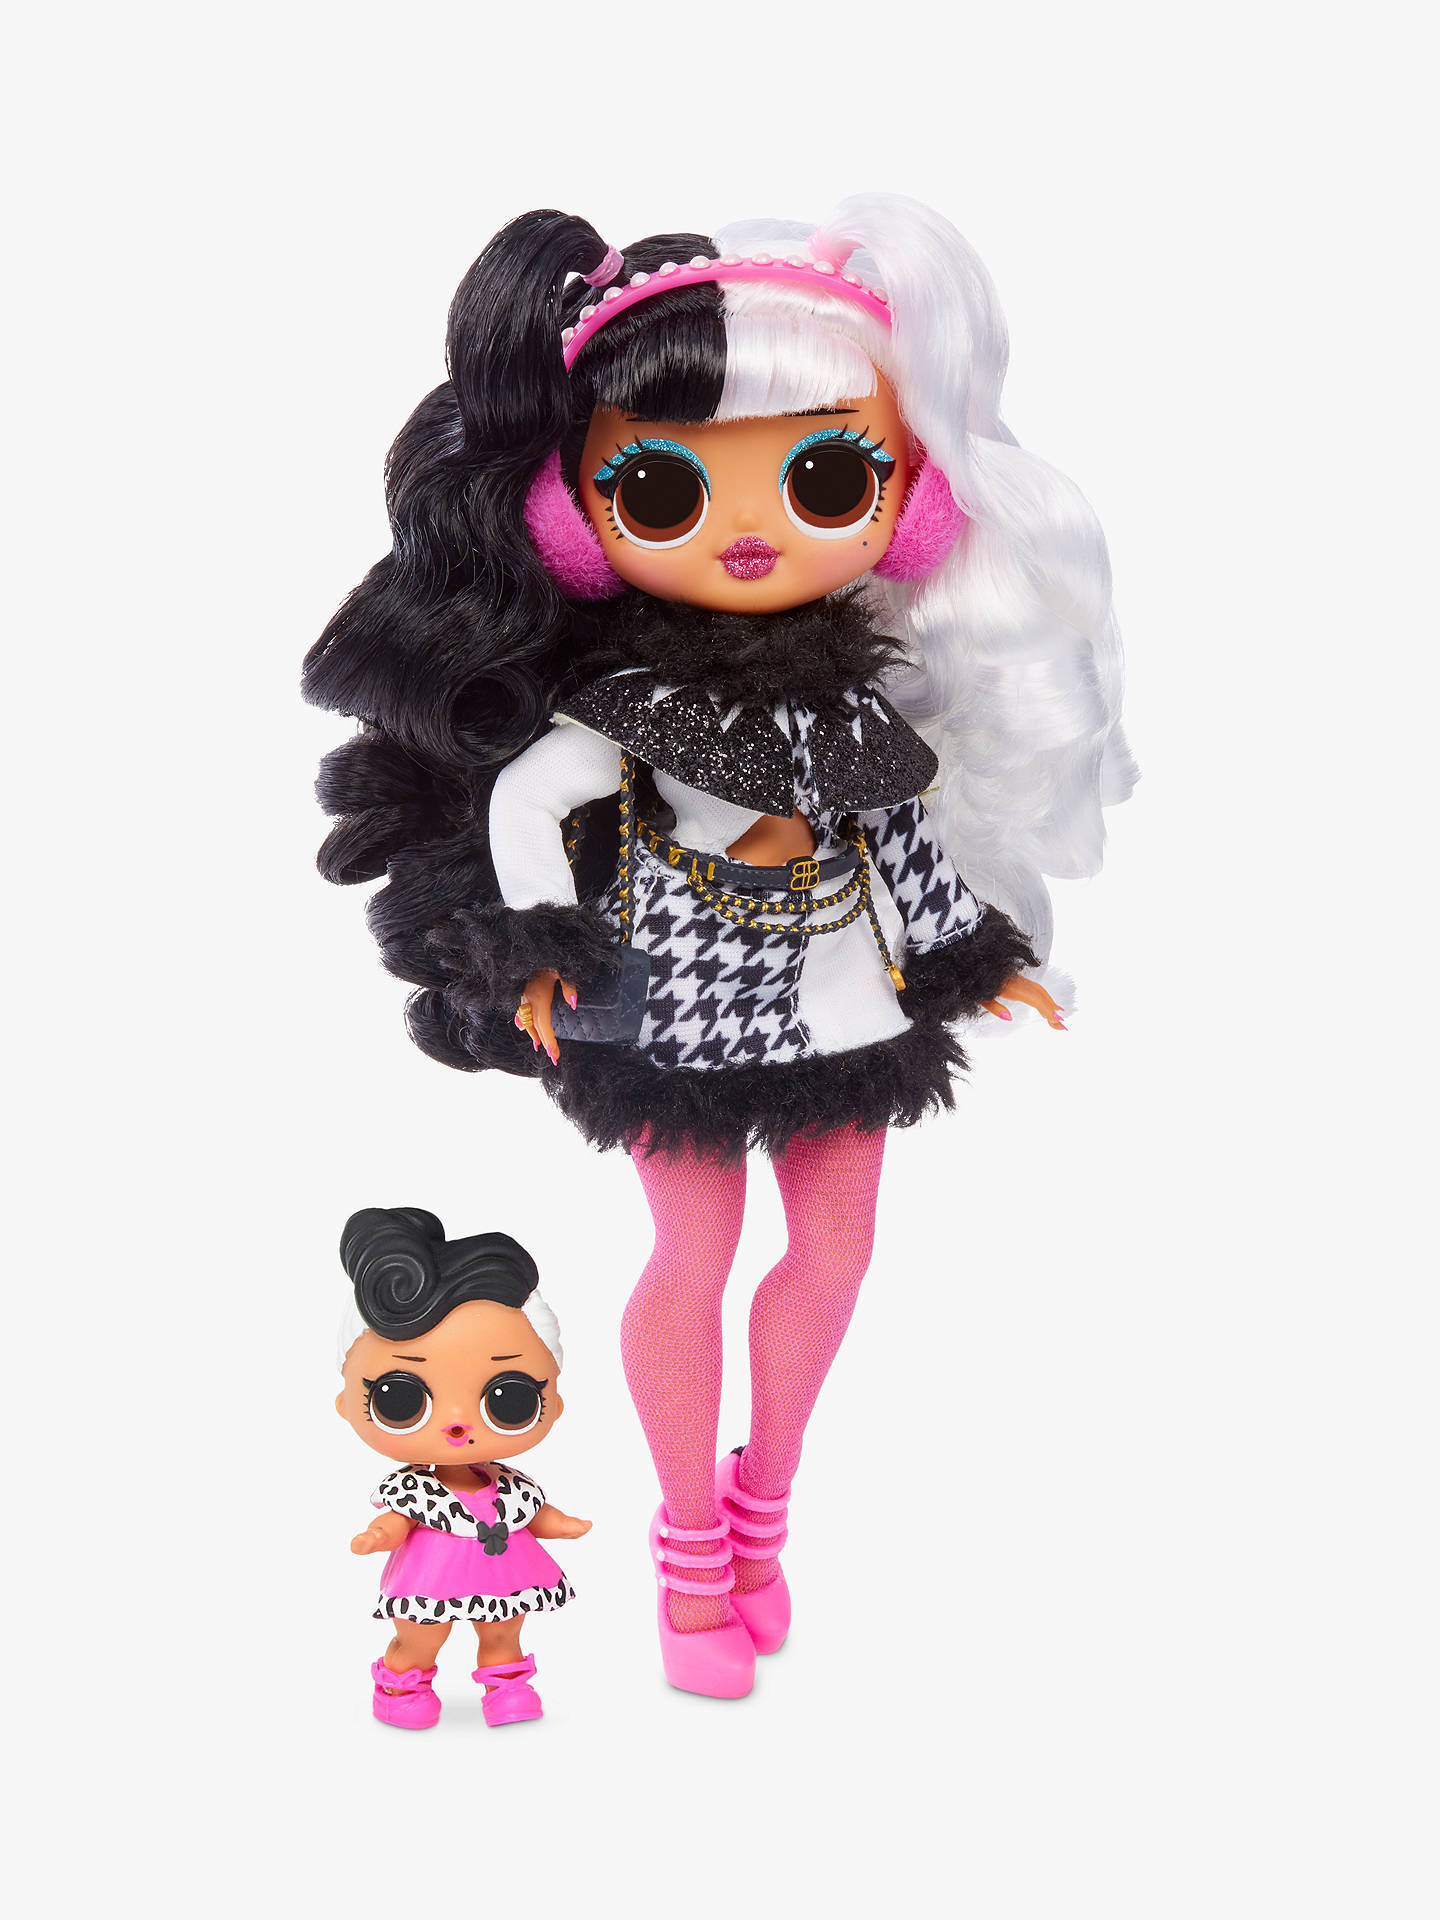 L O L Surprise Dollie Dollface Winter Disco Series Fashion Doll